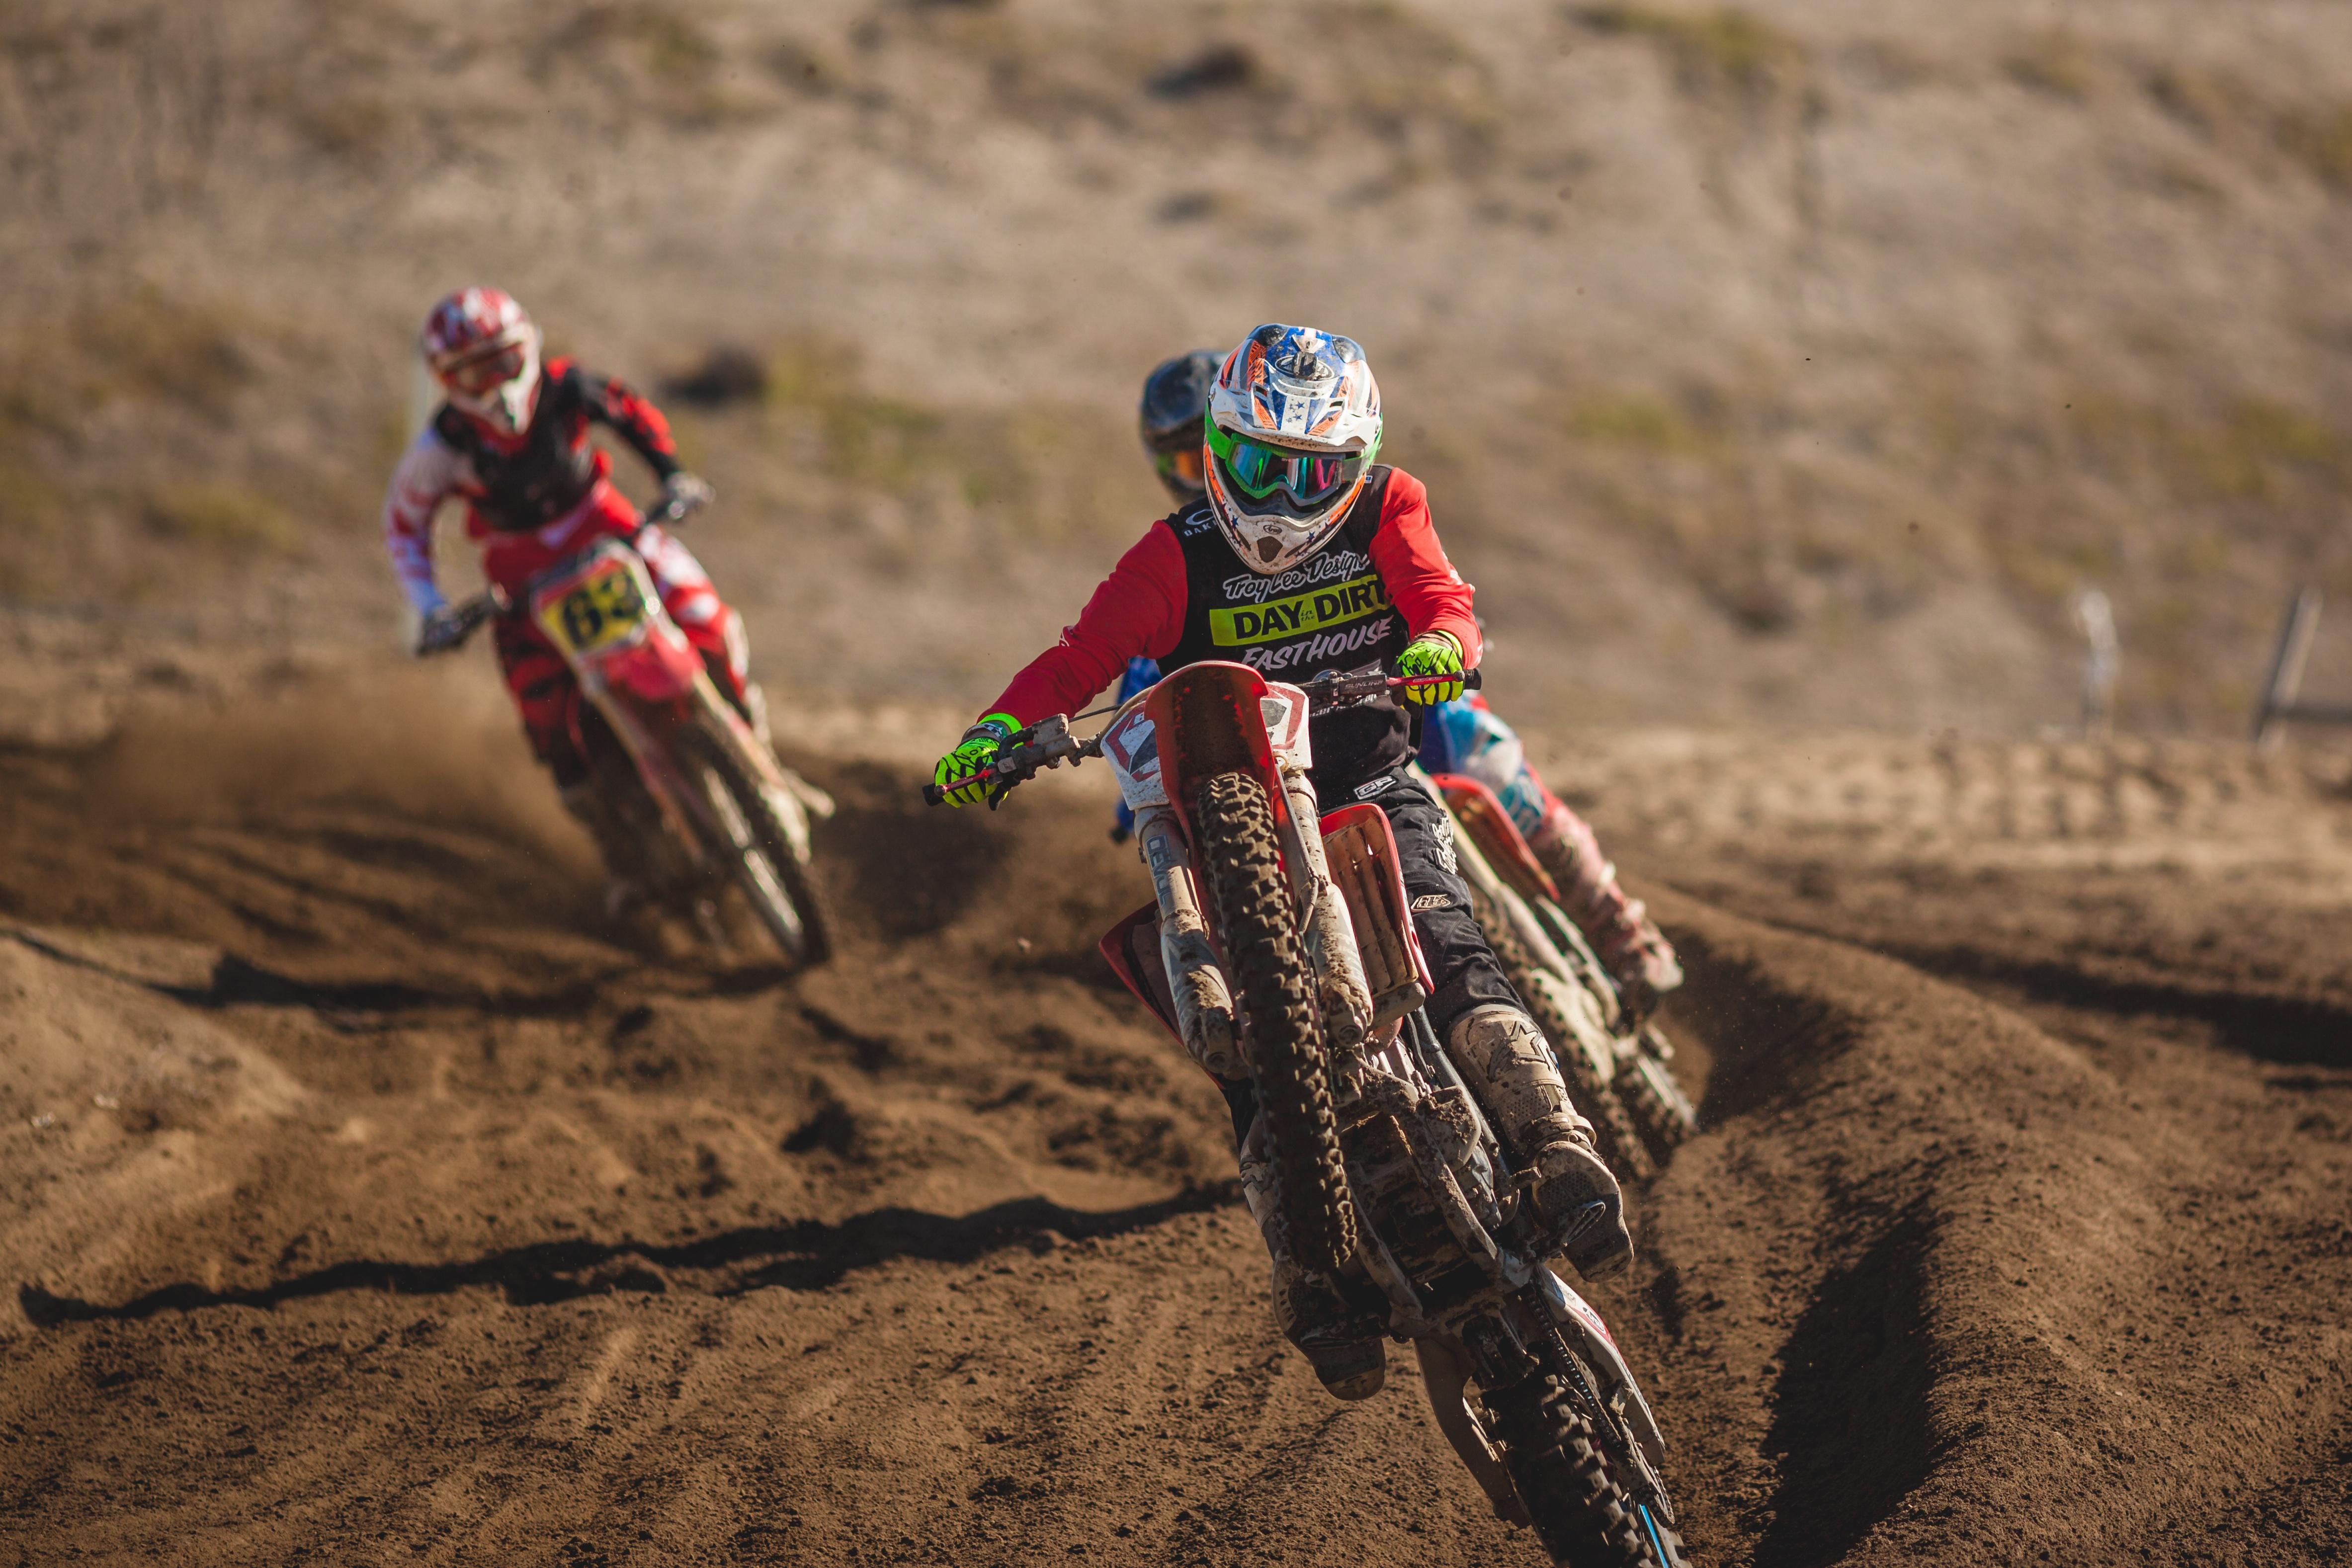 спорт мотоцикл гонка sports motorcycle race  № 3296441 без смс